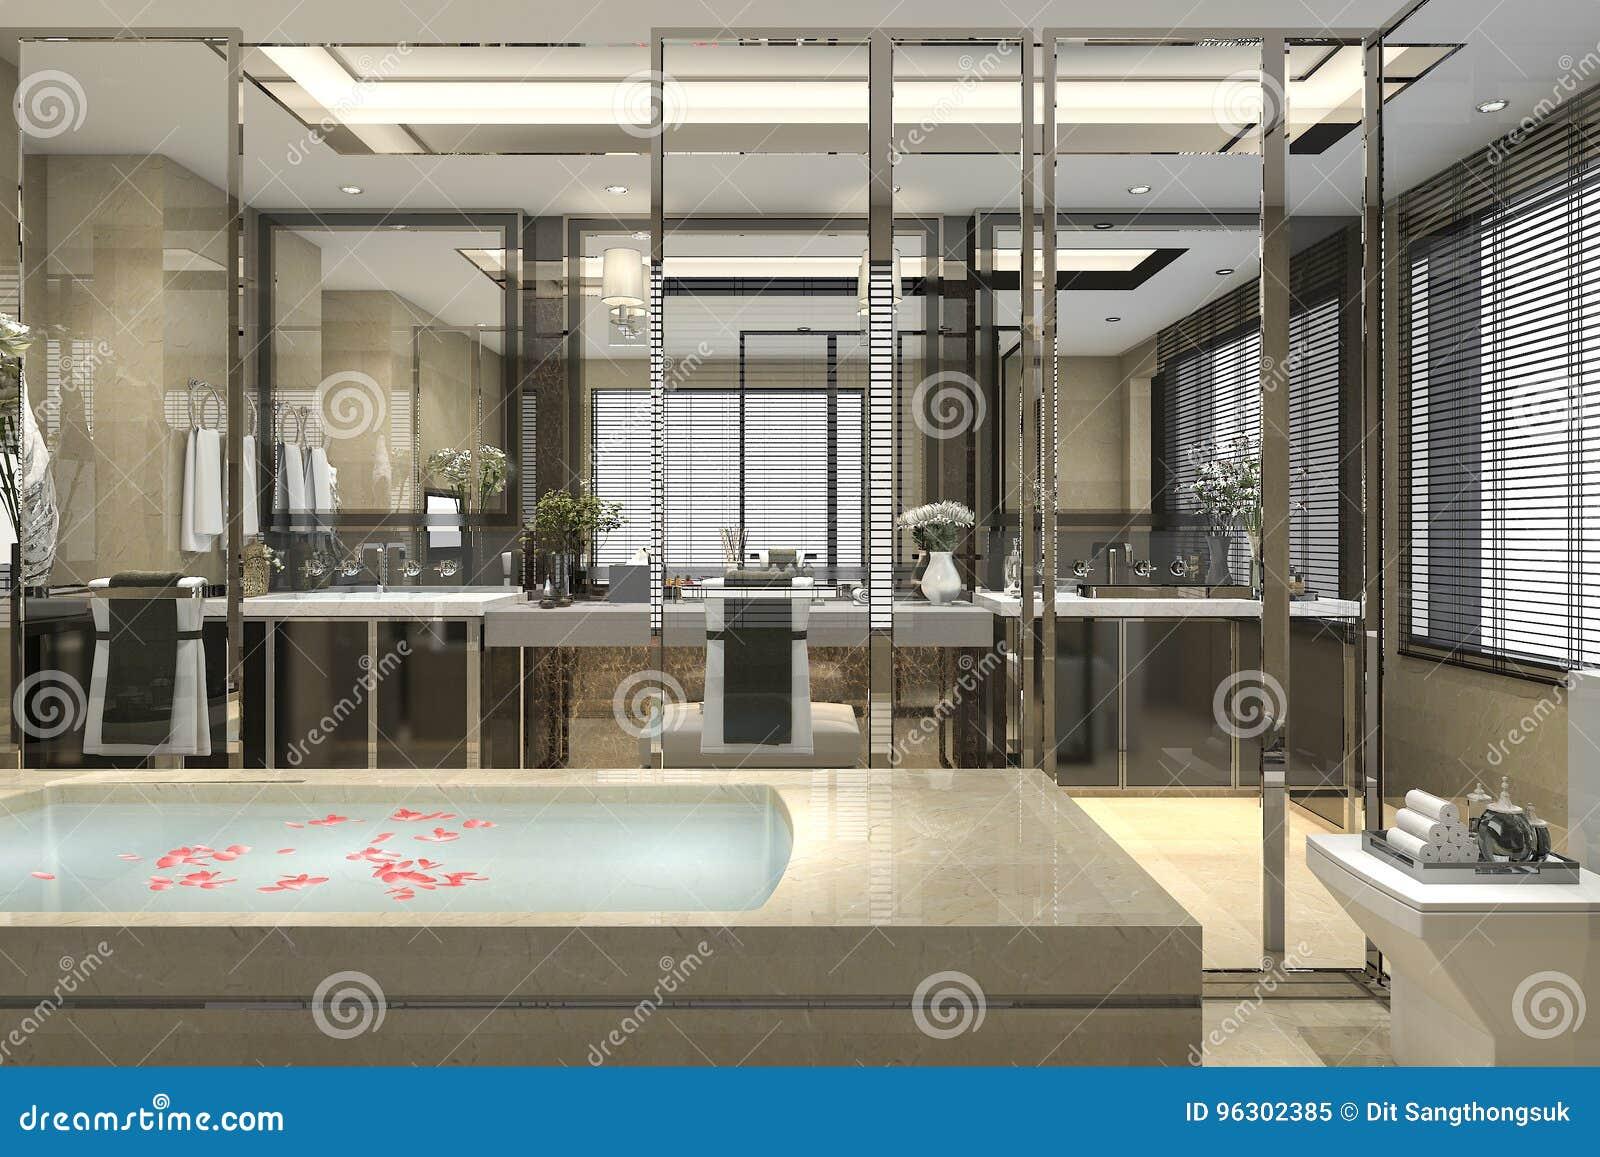 Bagni moderni sottotetto interesting fontanelle with bagni